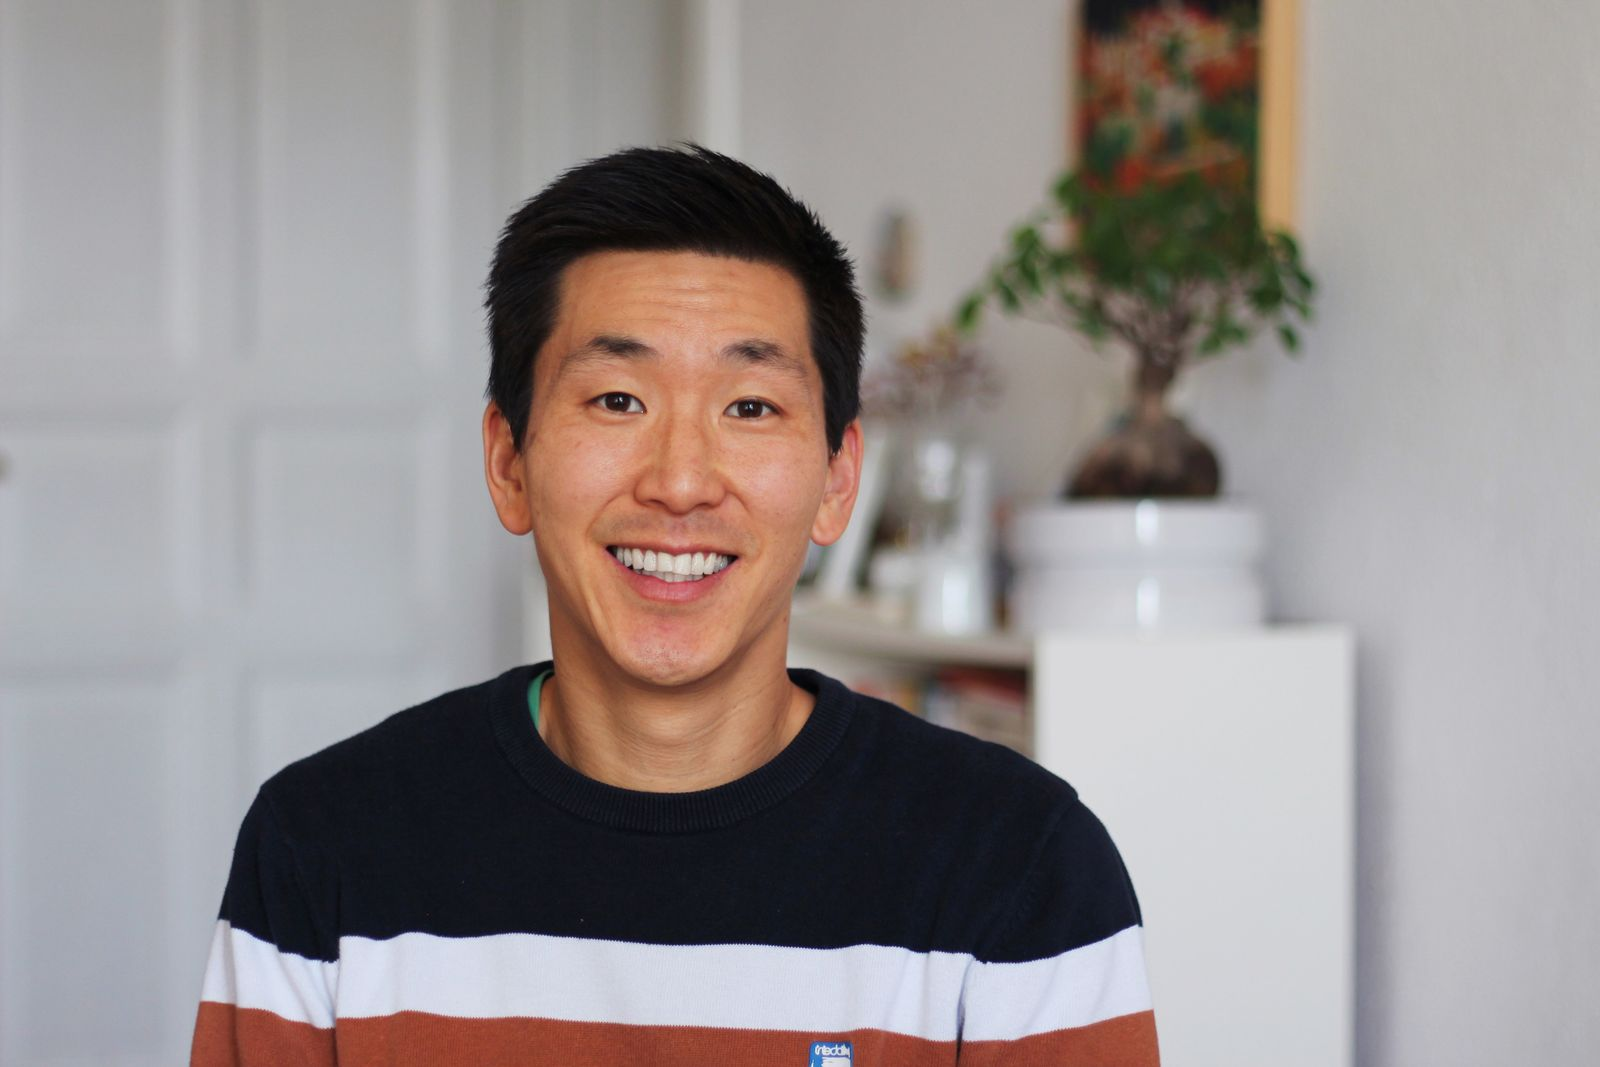 Frank Joung